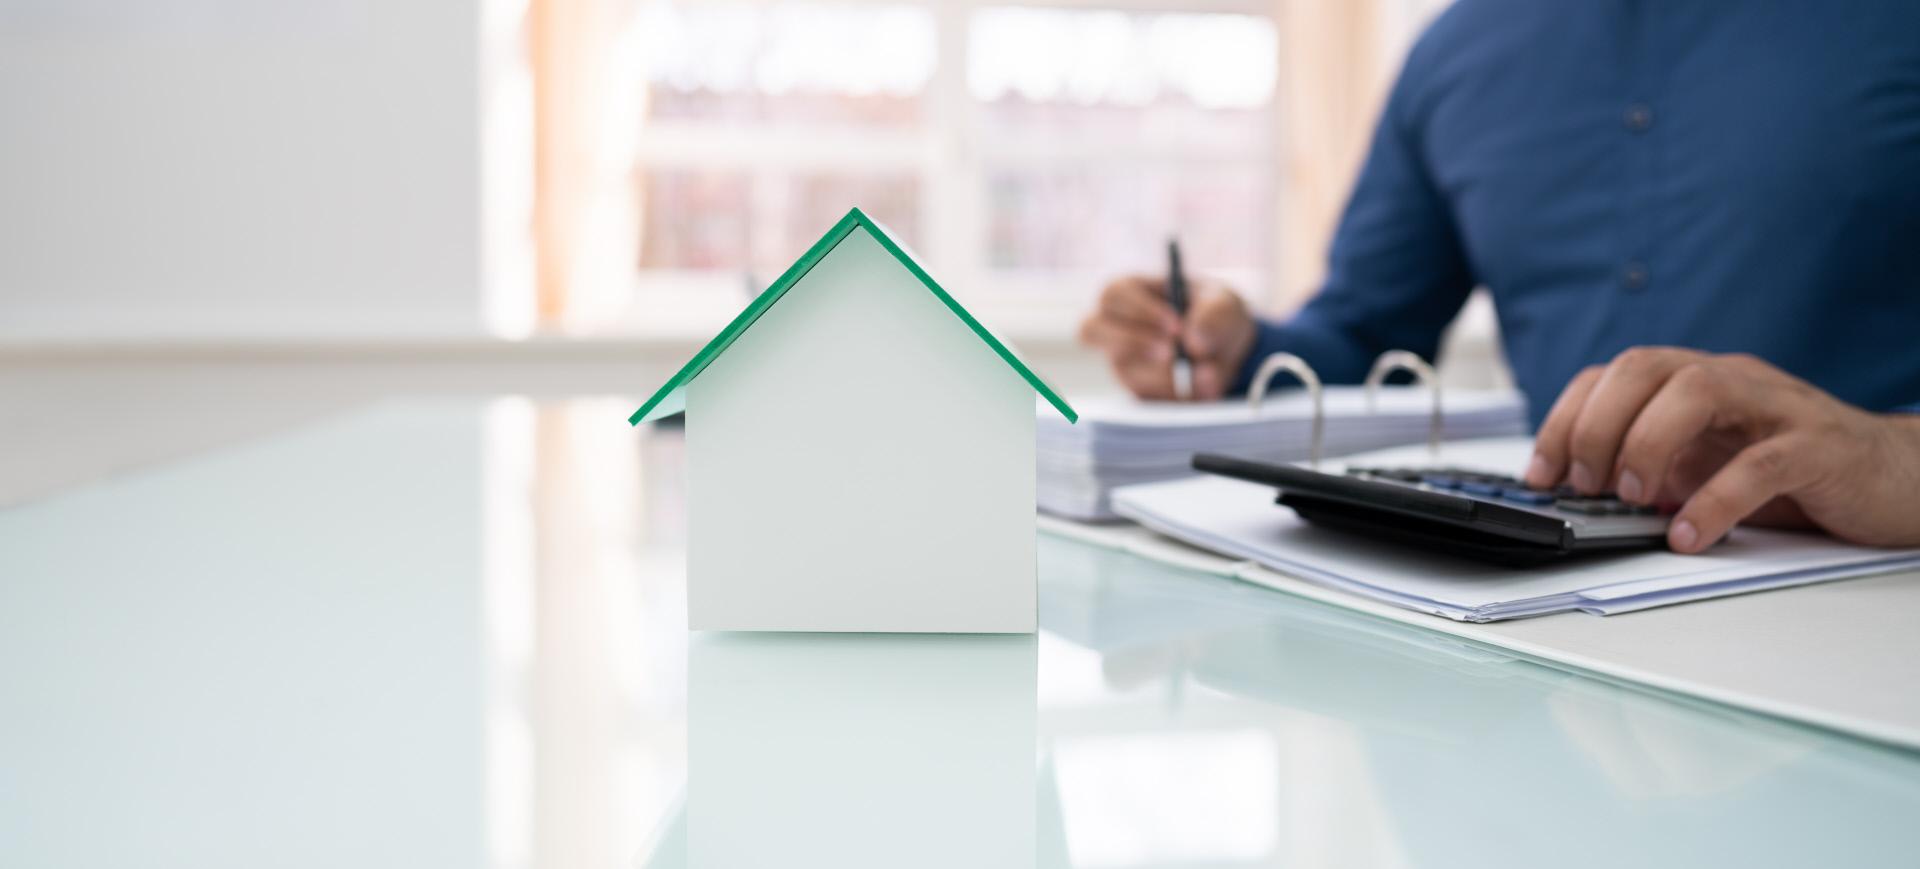 Casas eficientes 2021: Estado já pagou os primeiros apoios no valor de 180 mil euros